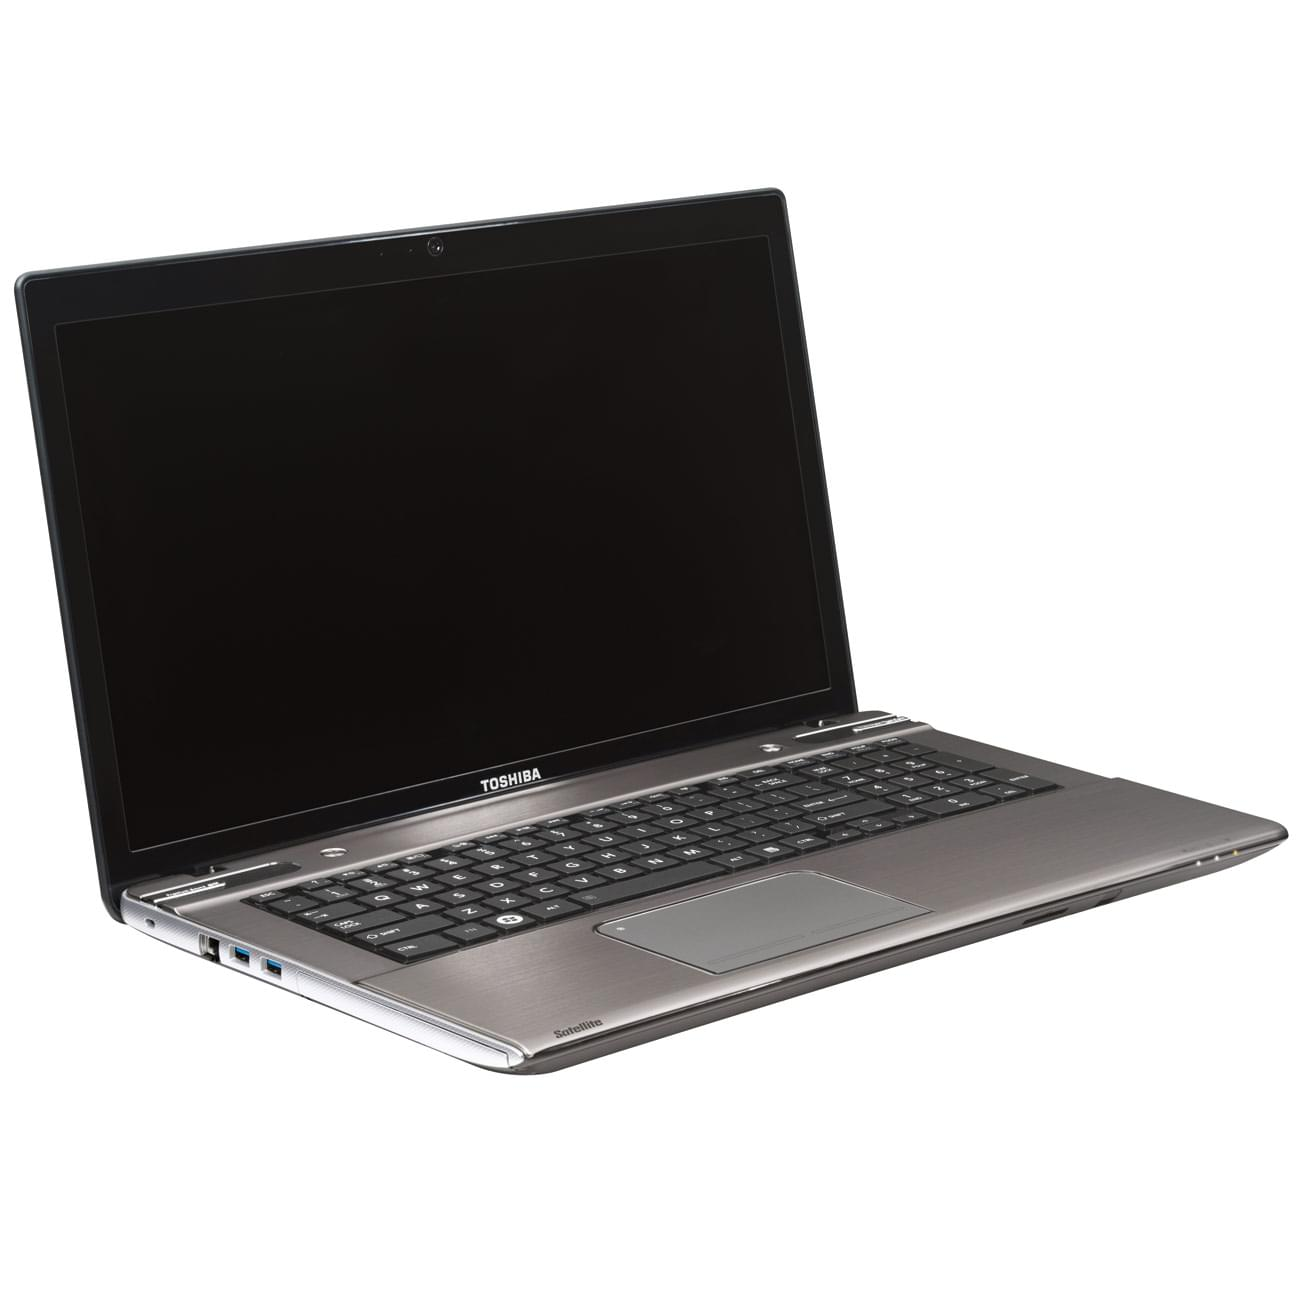 Toshiba P870-327 (PSPLFE-00X009FR) - Achat / Vente PC portable sur Cybertek.fr - 0